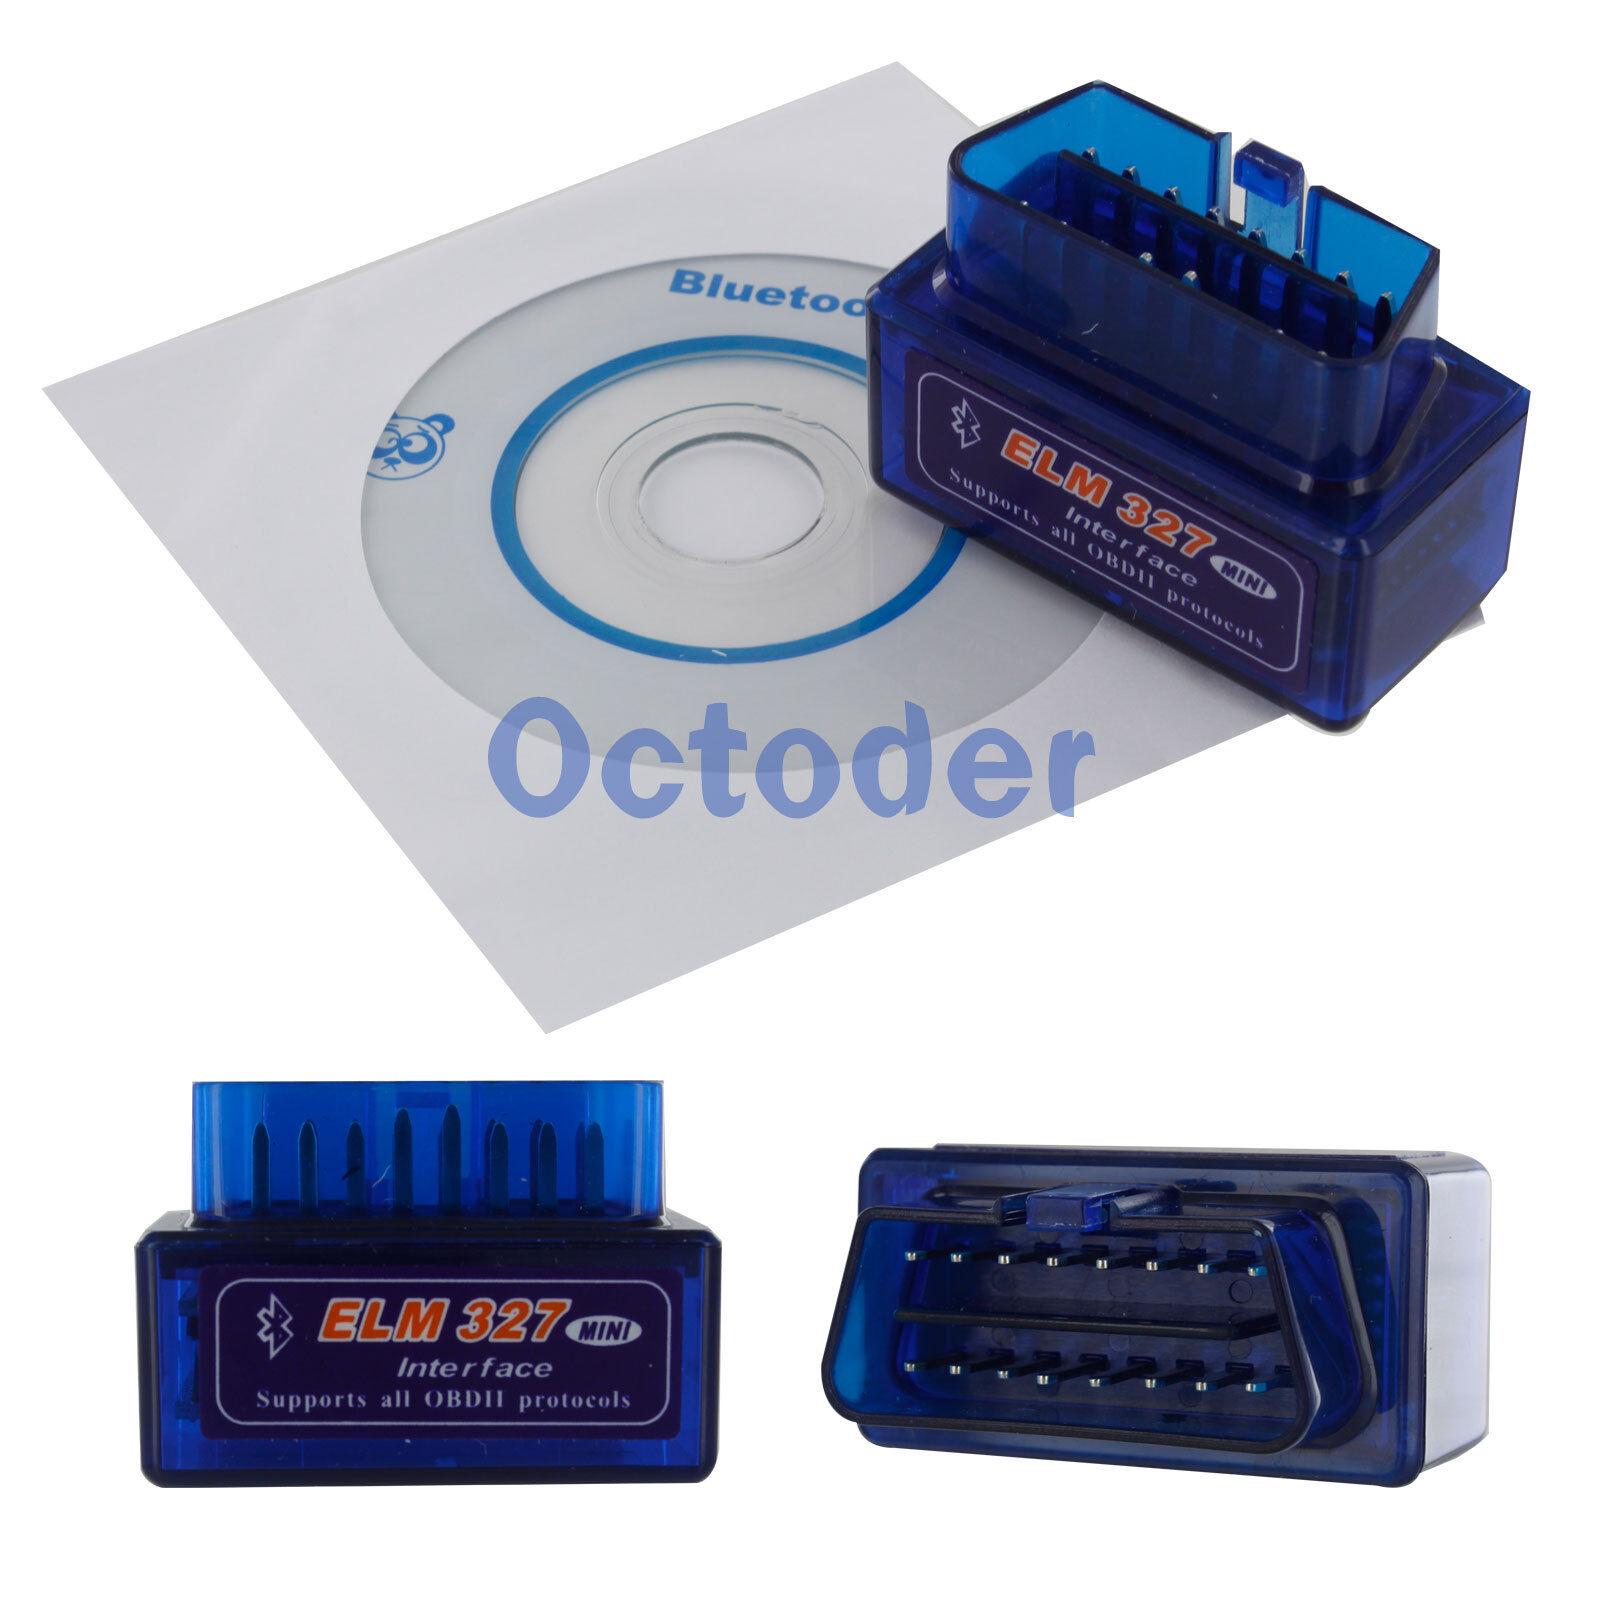 Bluetooth OBD-II Scanner